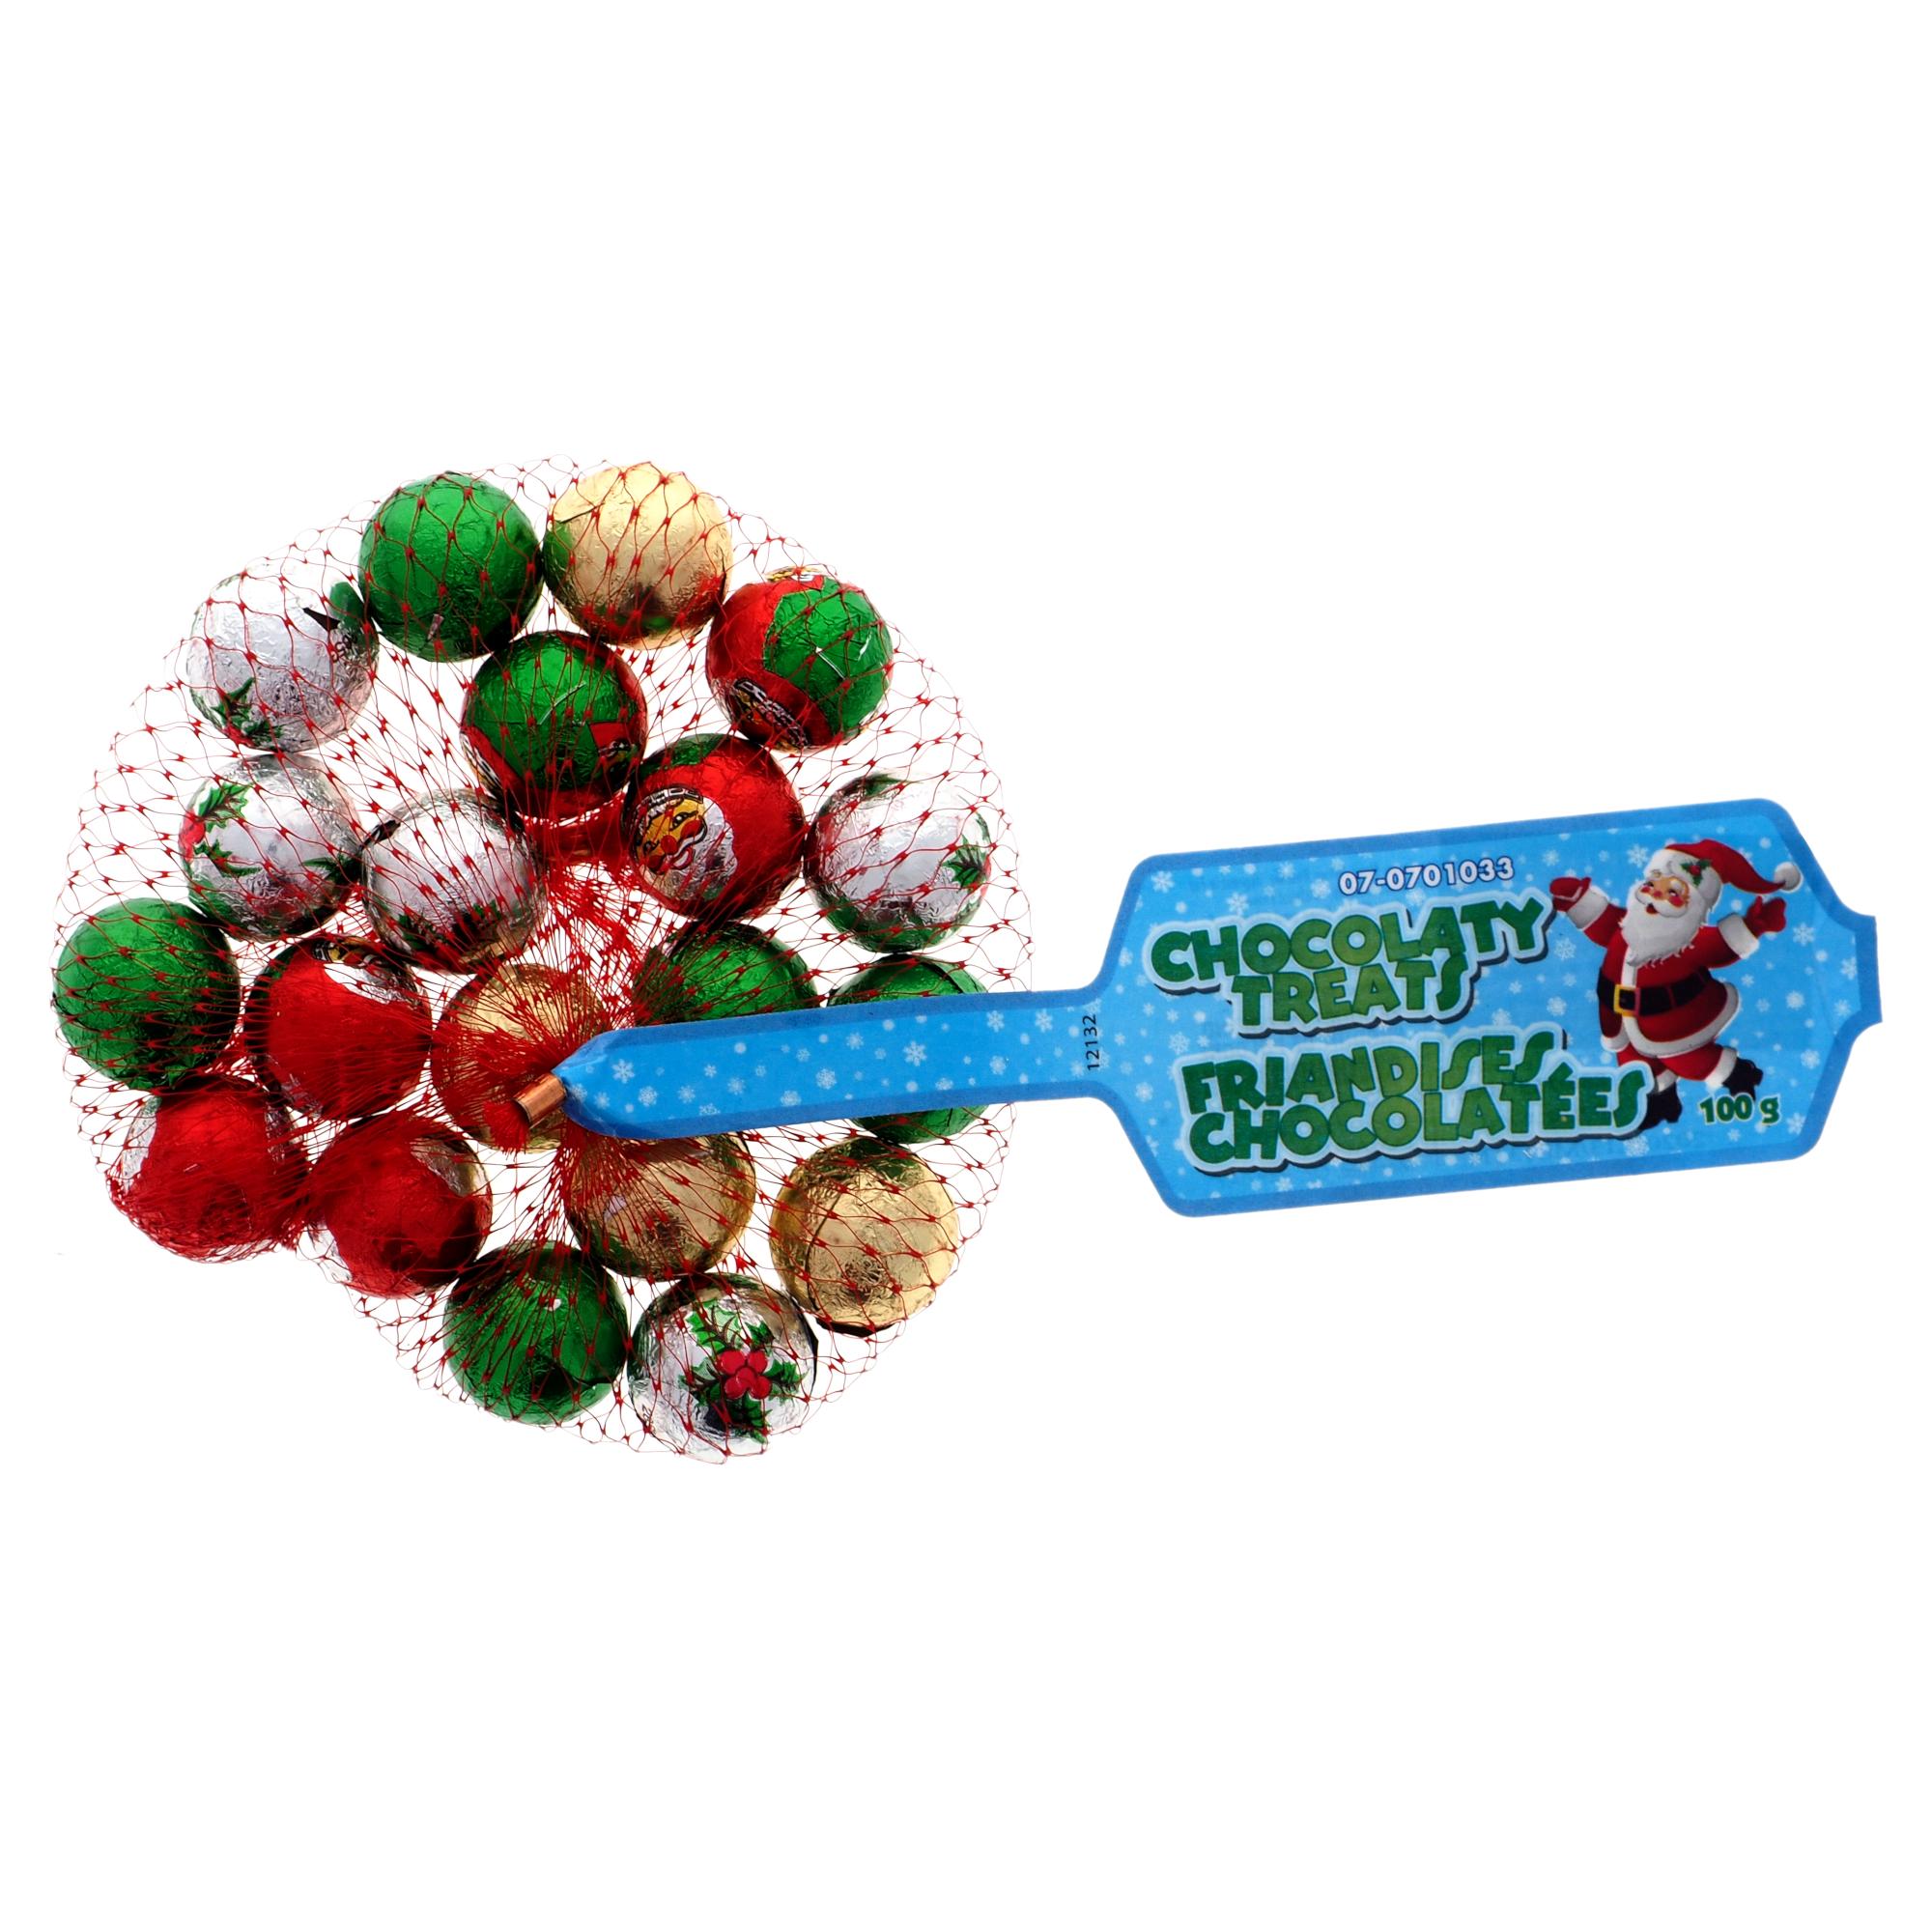 Chocolaty Balls in Net Bag